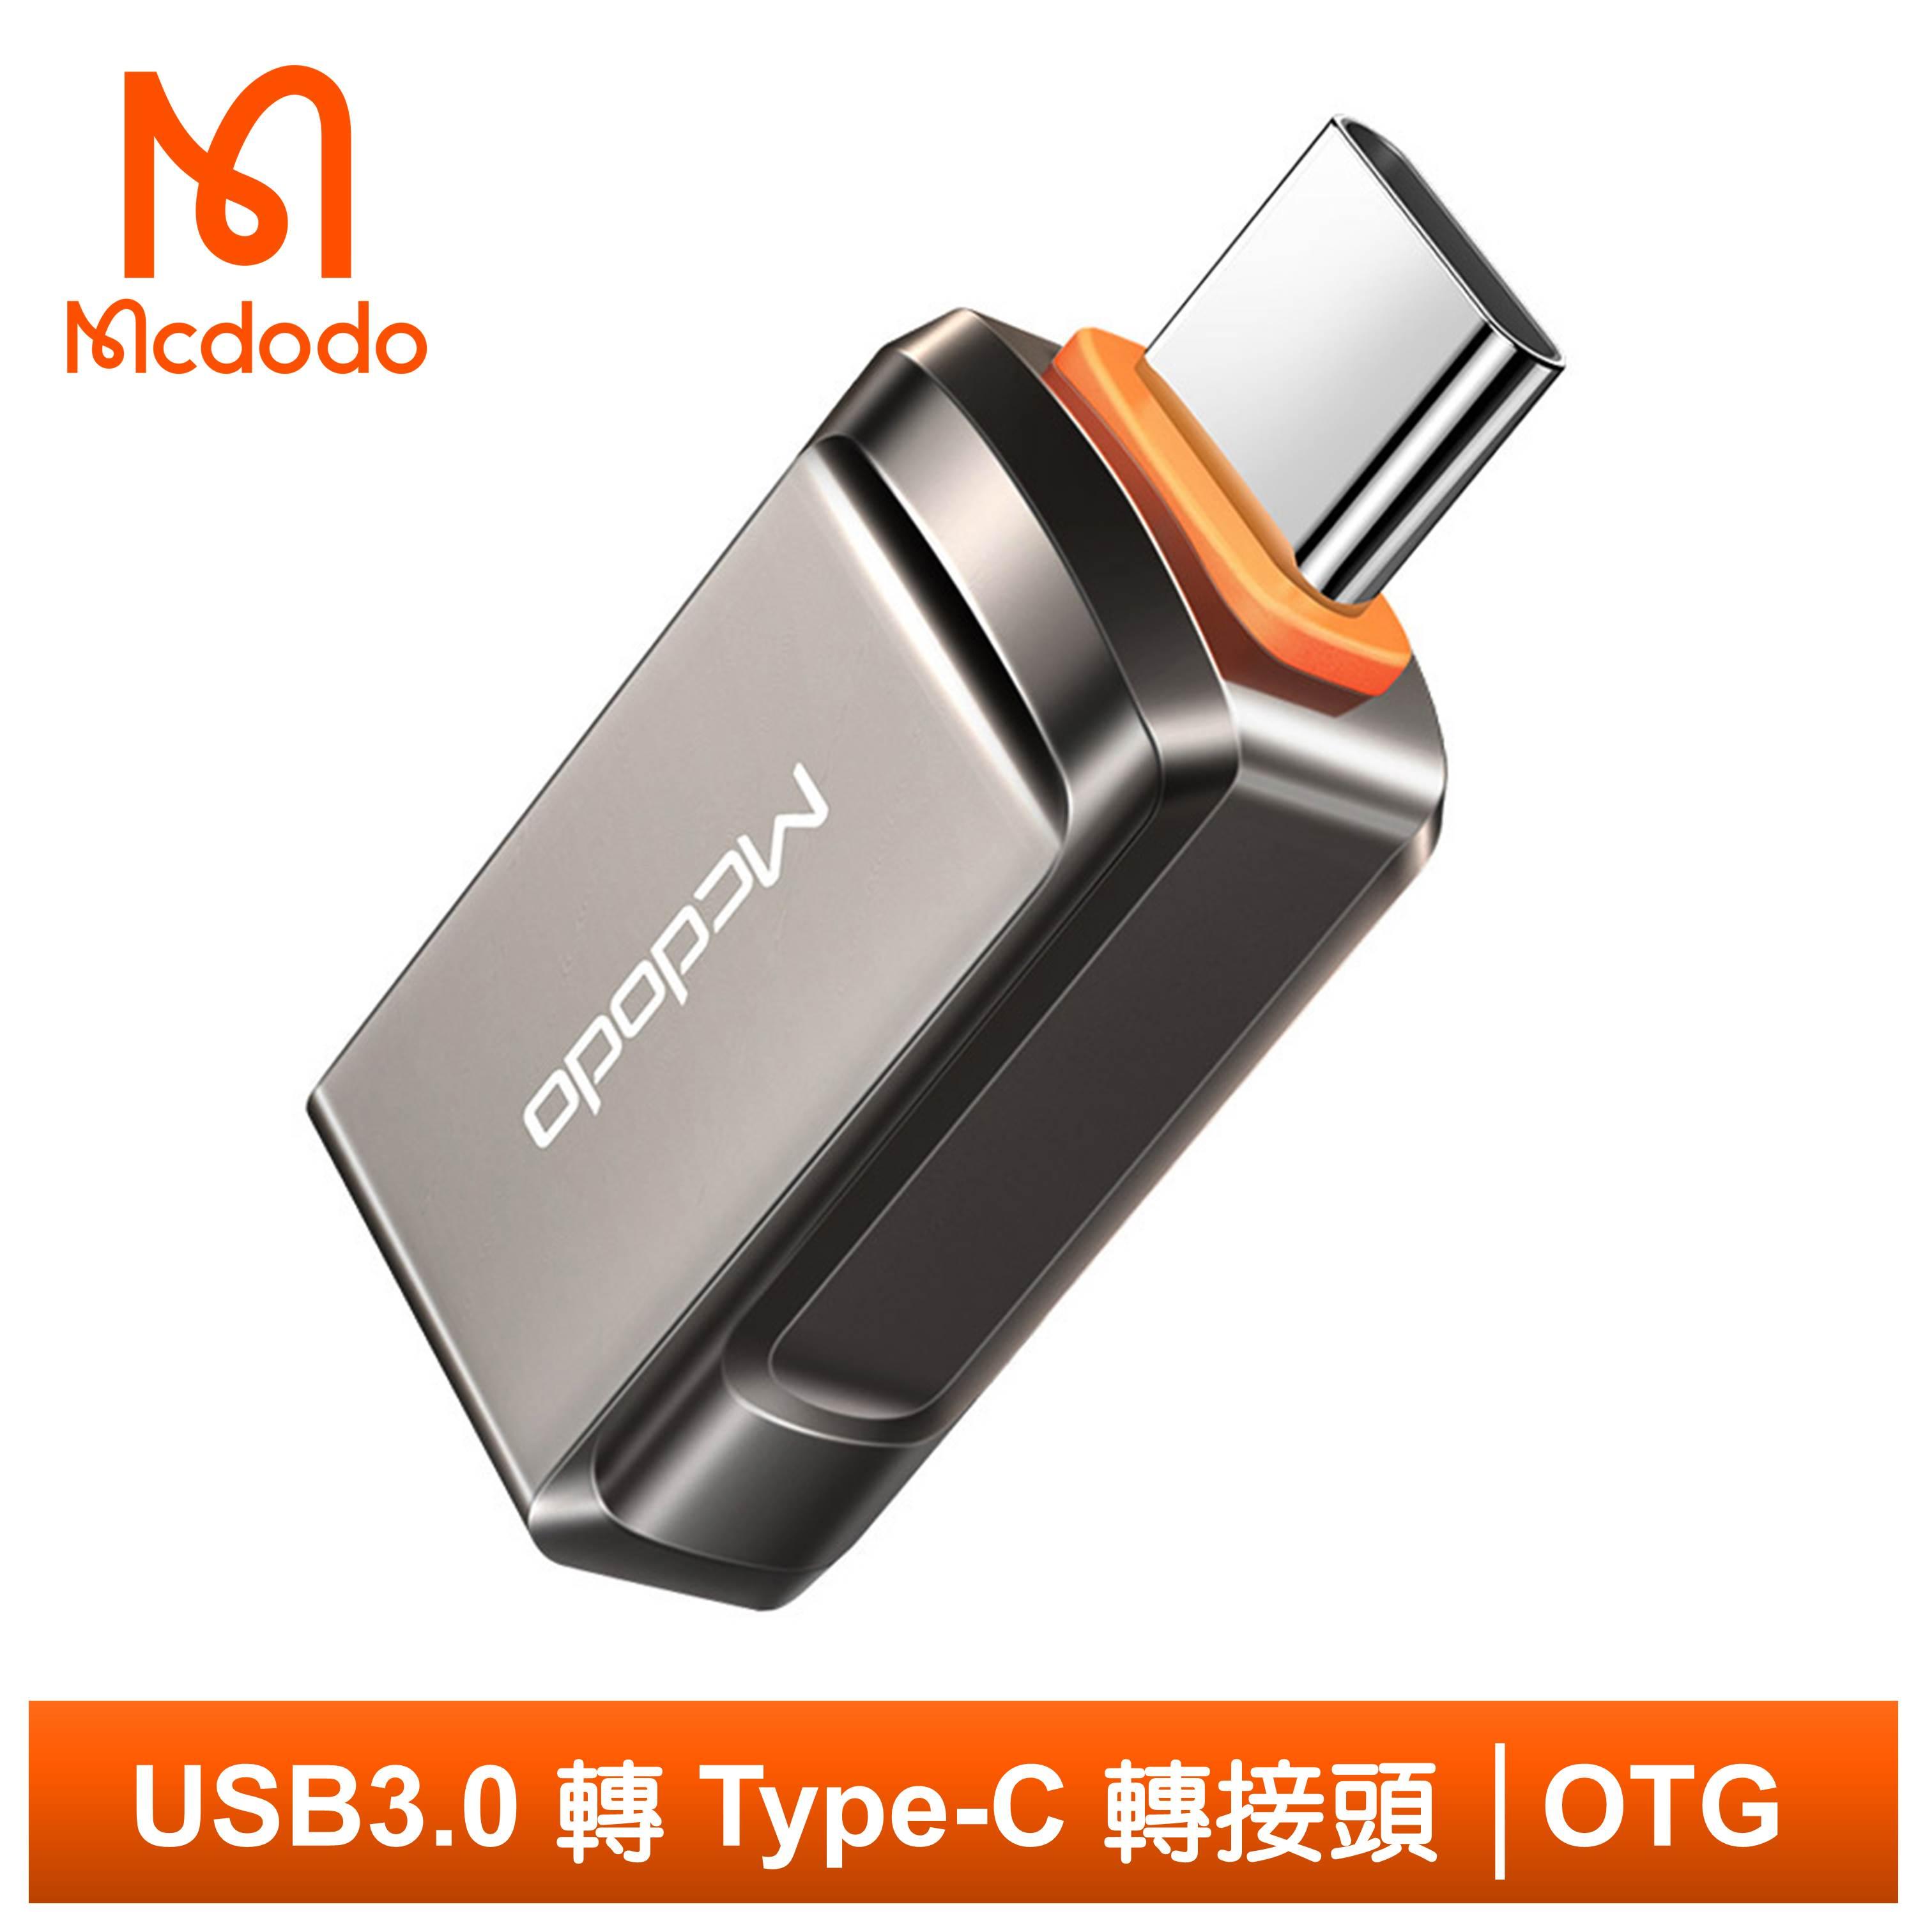 Mcdodo麥多多台灣官方 USB3.0 轉 Type-C轉接頭轉接器轉接線 OTG 迪澳系列